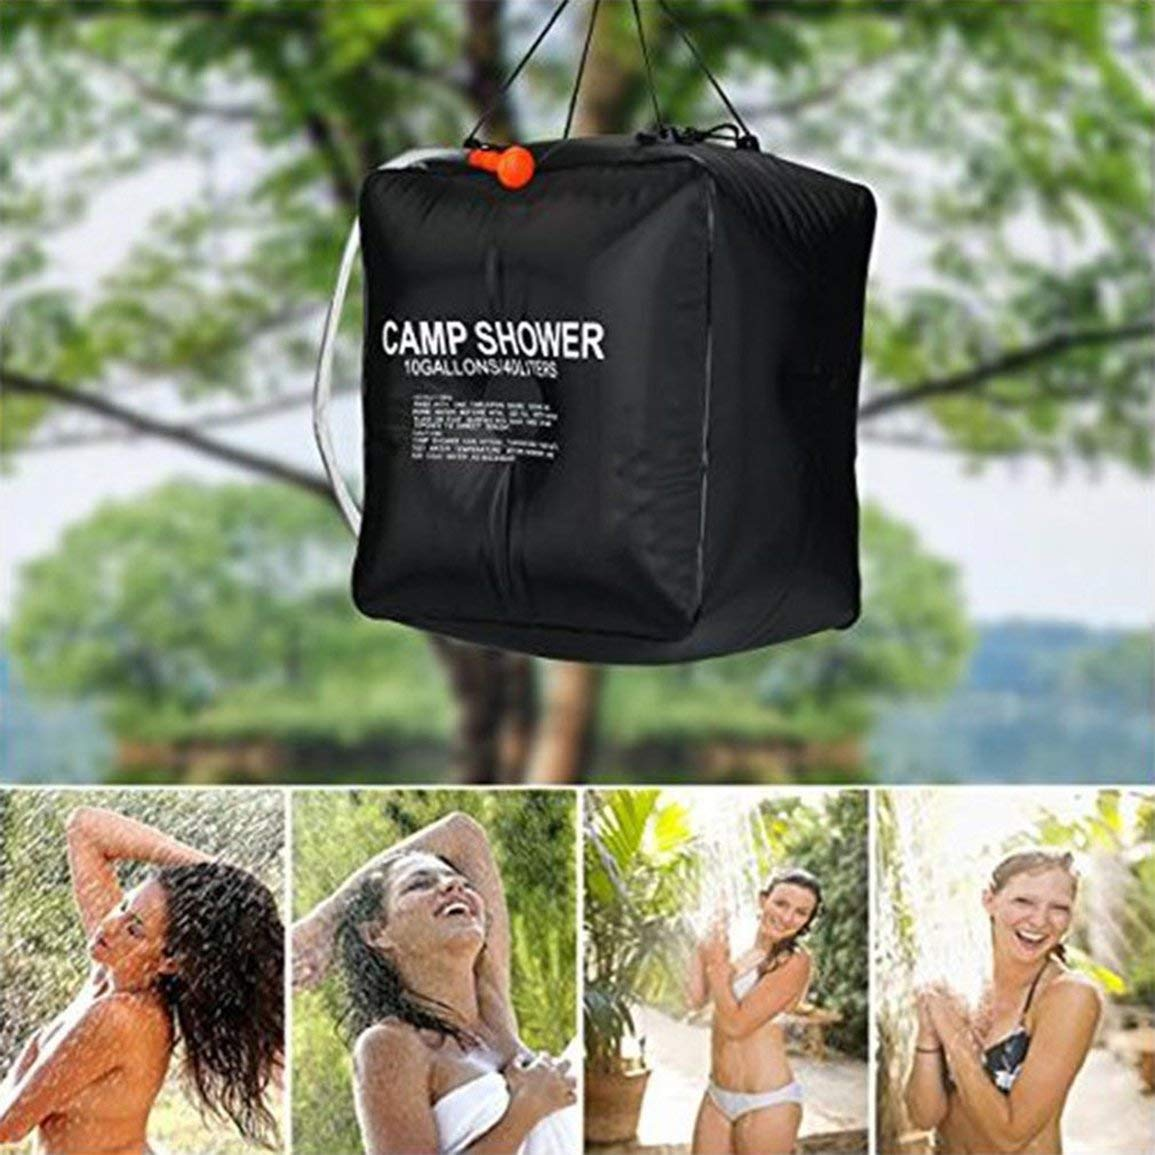 40 L, Agua Caliente, 45 /°C Bolsa de Ducha con calefacci/ón Solar Fantasyworld